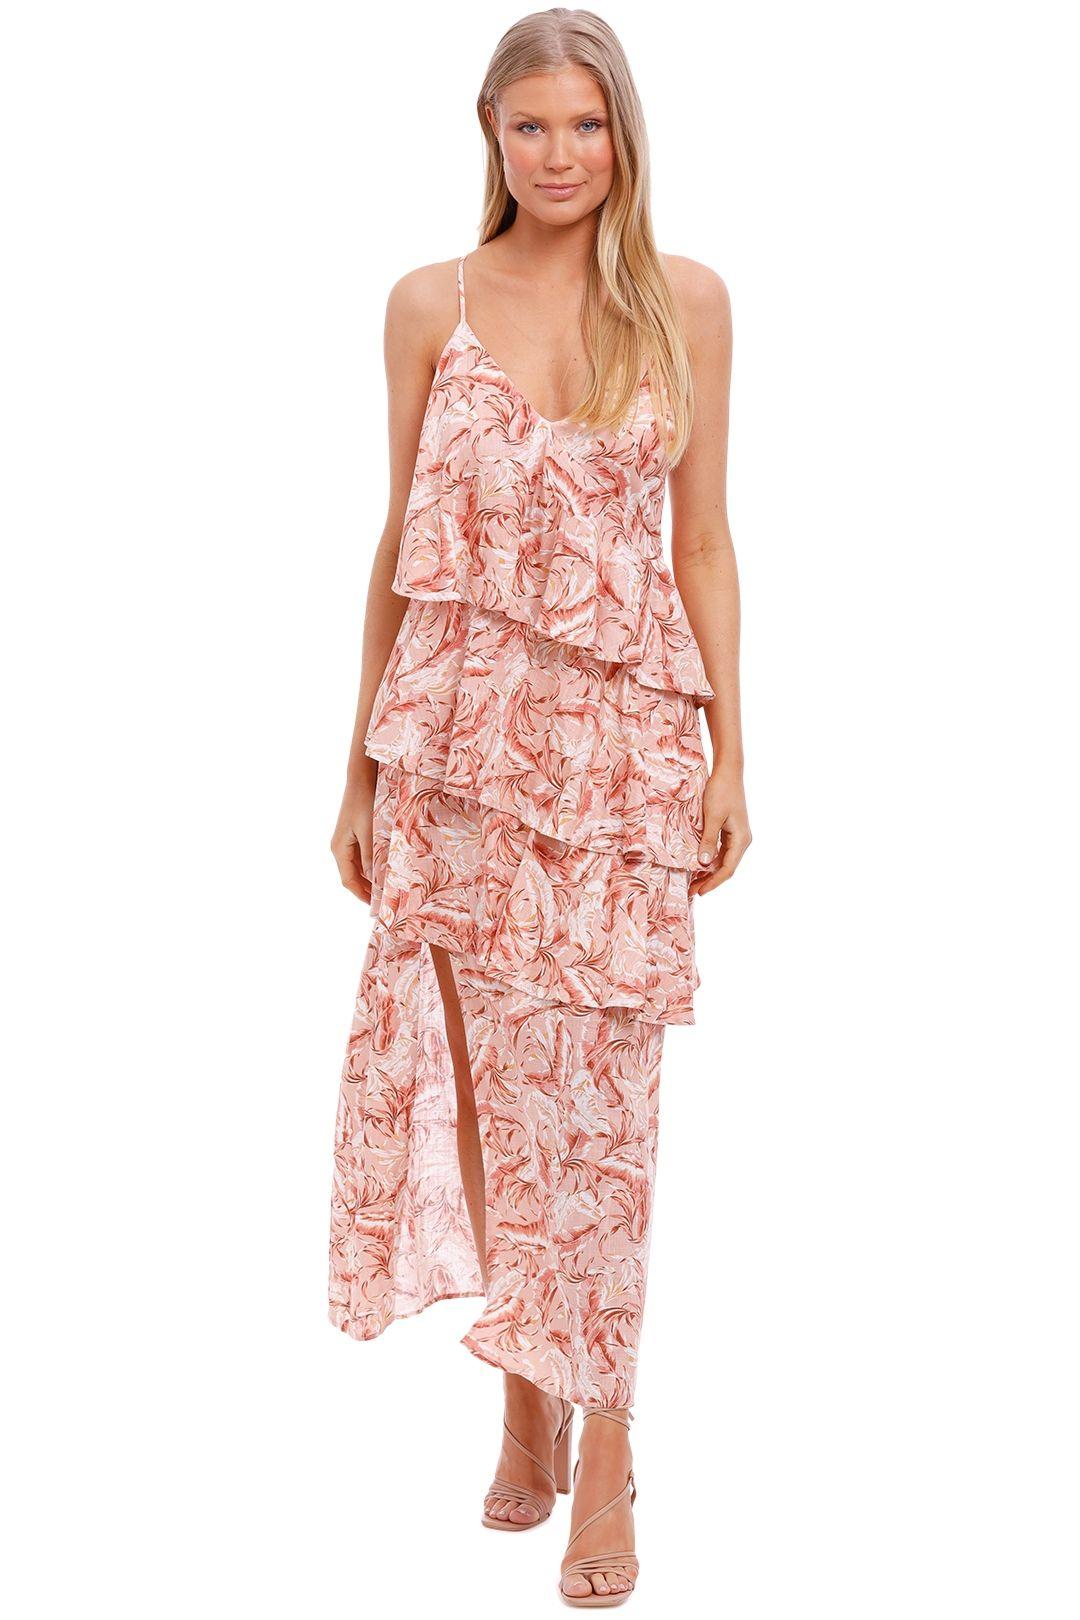 Mink Pink South Coast Palm Midi Dress